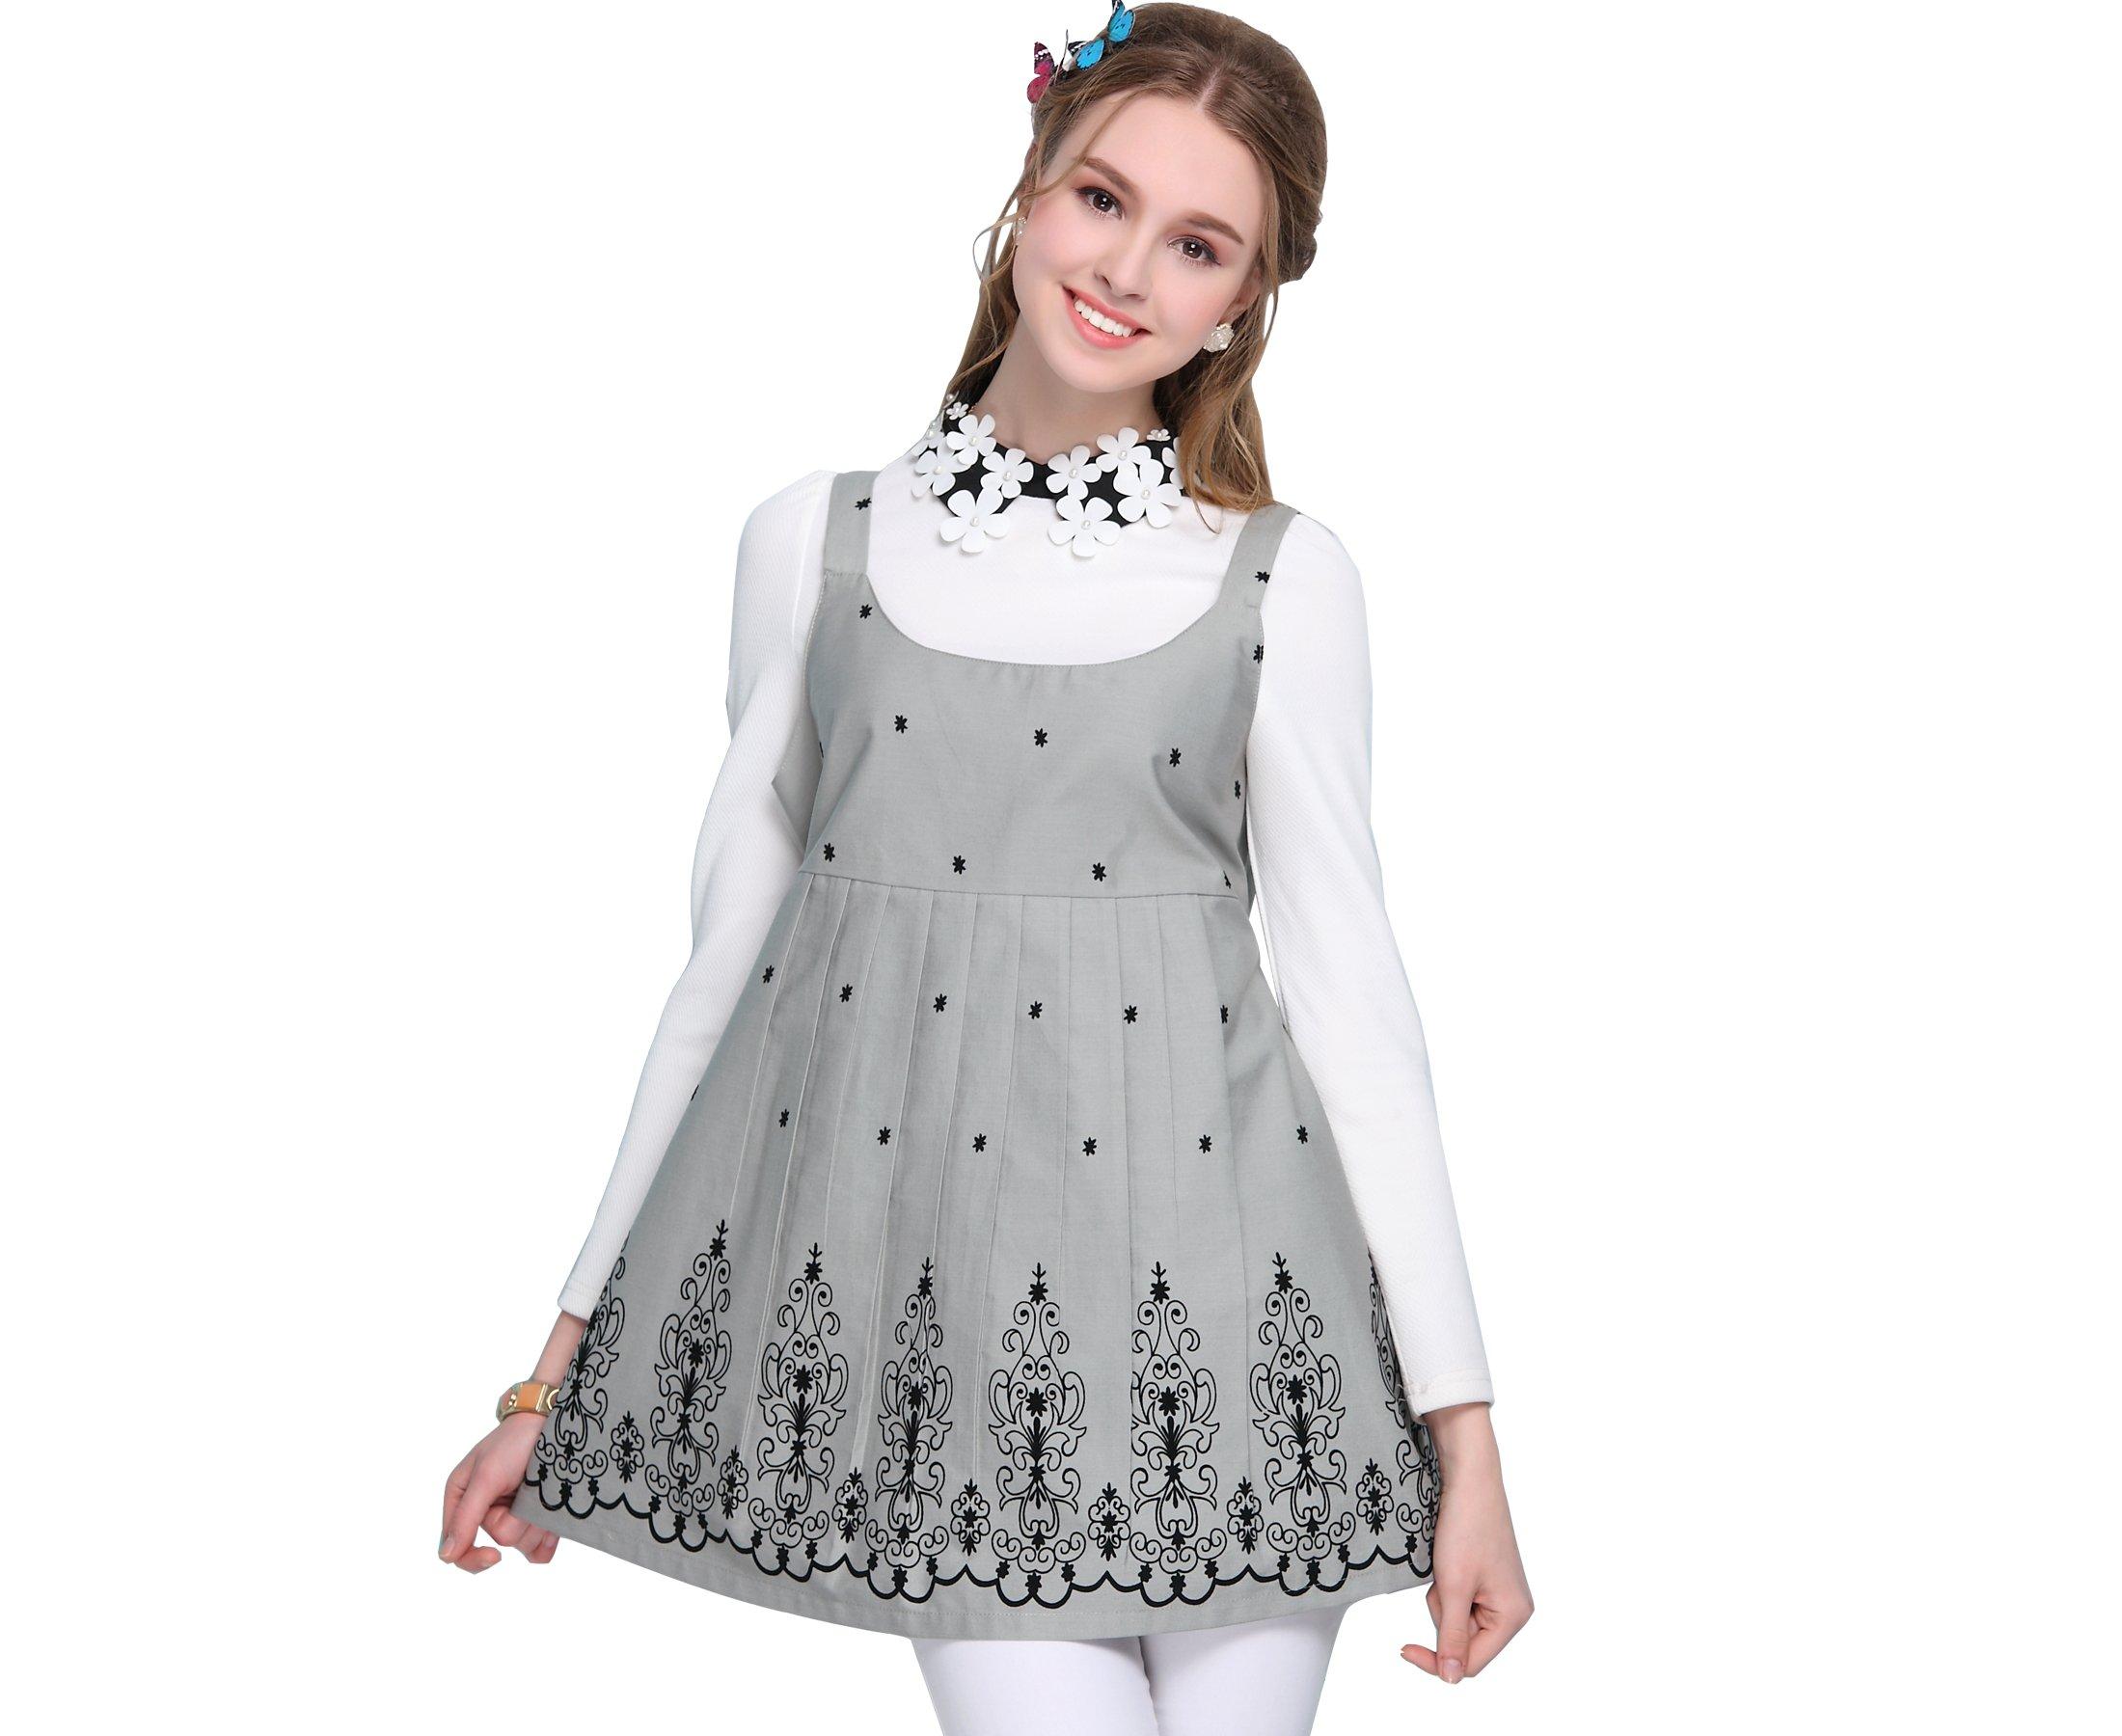 LVFEIER Anti-Radiation Shielding Vest/Dress During Pregnancy Grey by LVFEIER